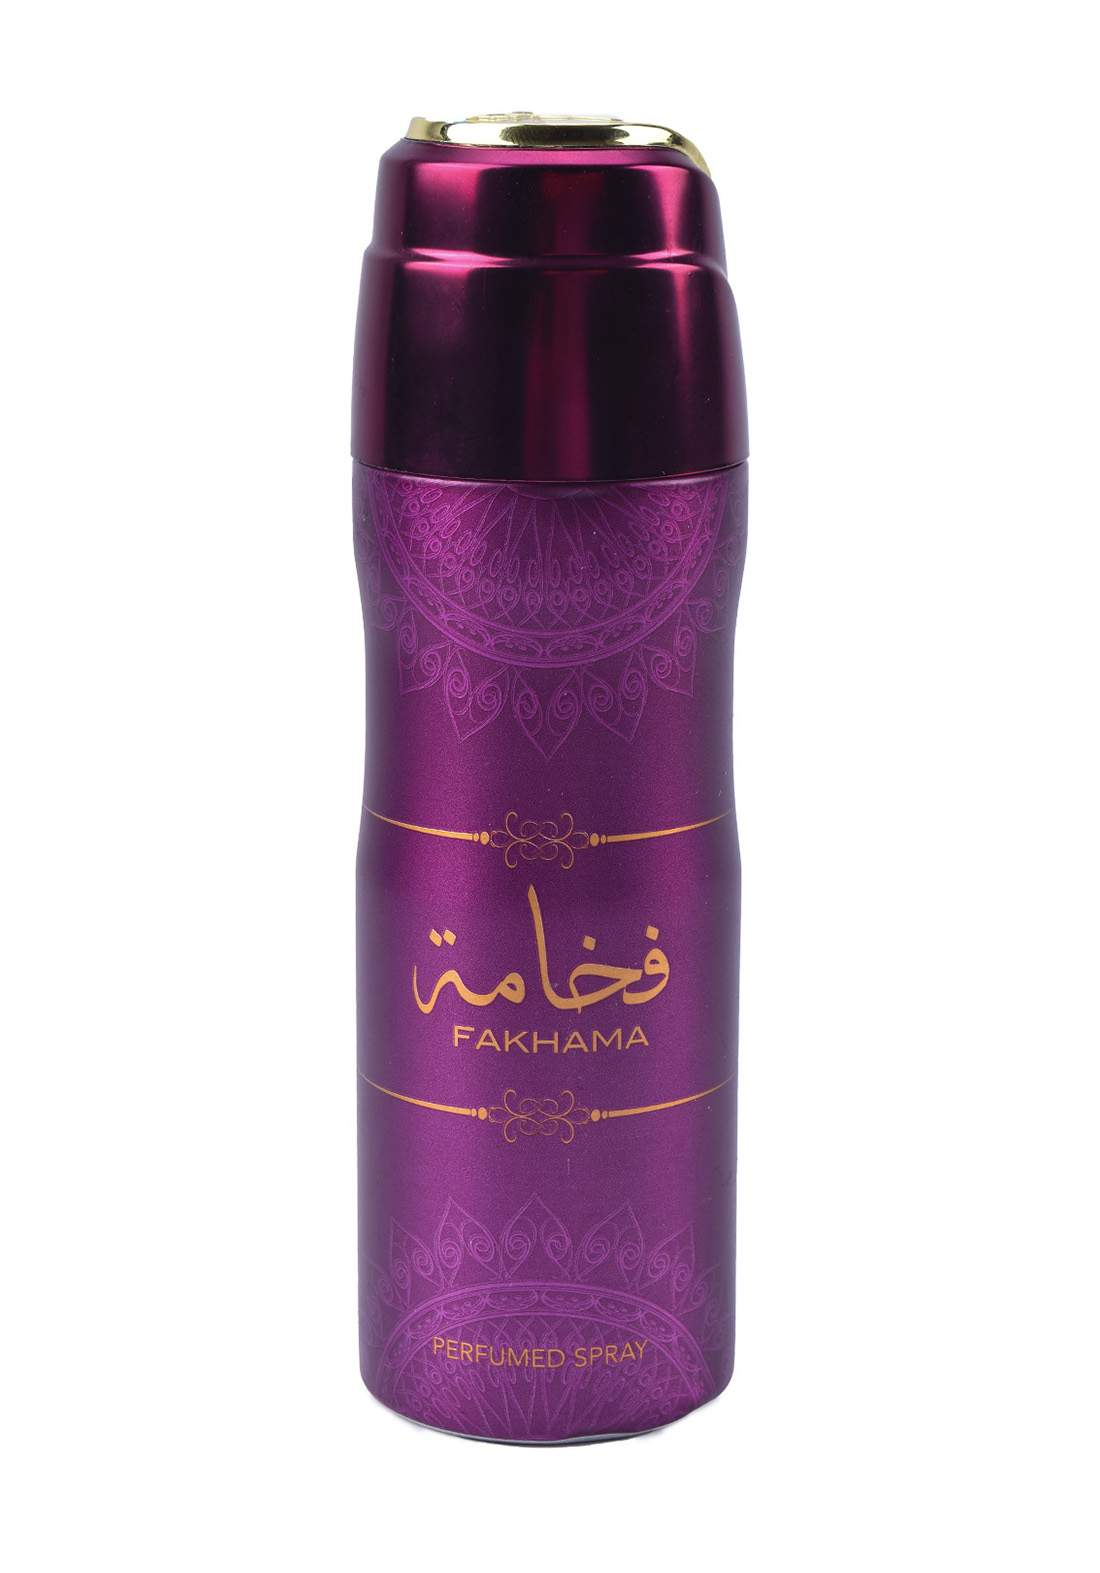 Ard Al Khaleej Fakhama Perfumed Spray 200ml For Women بخاخ معطر